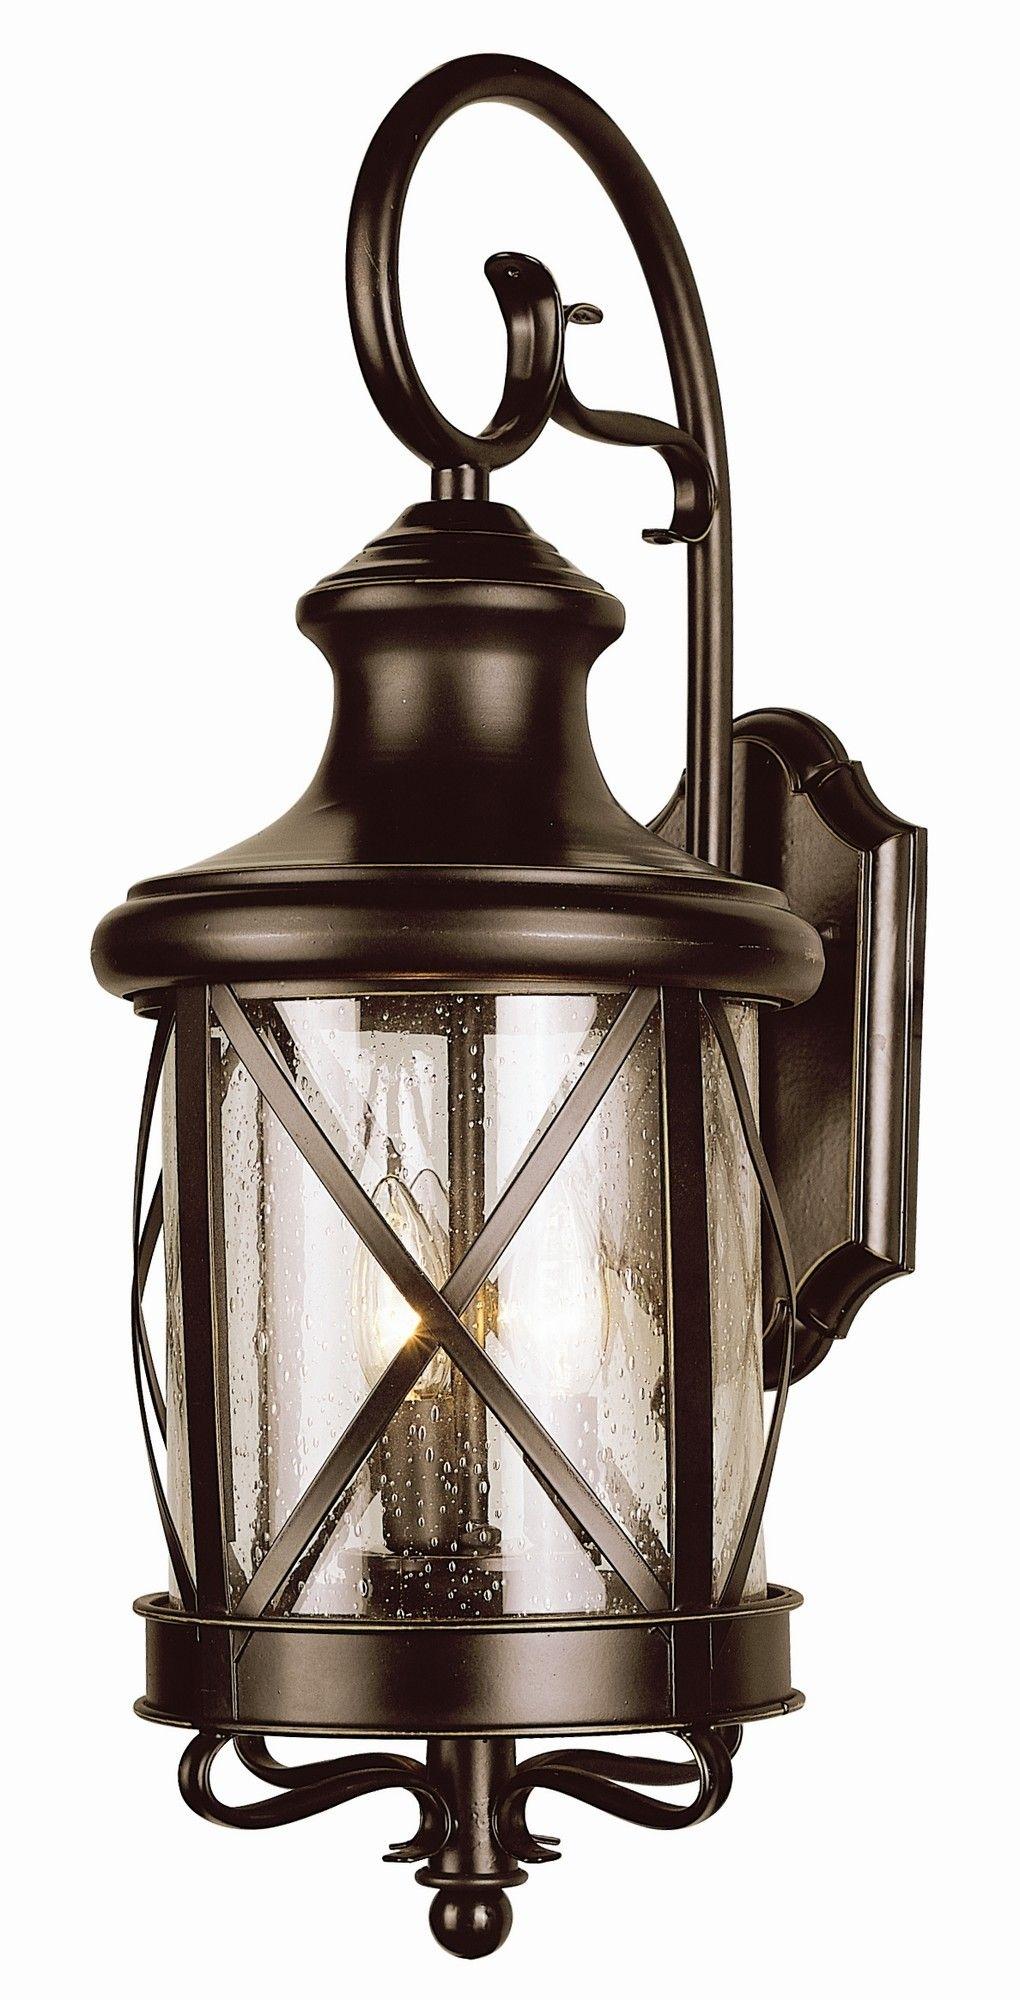 Inspiration about Transglobe Lighting Outdoor Wall Lantern | Wayfair | Lighting Intended For Modern Garden Porch Light Fixtures At Wayfair (#11 of 15)